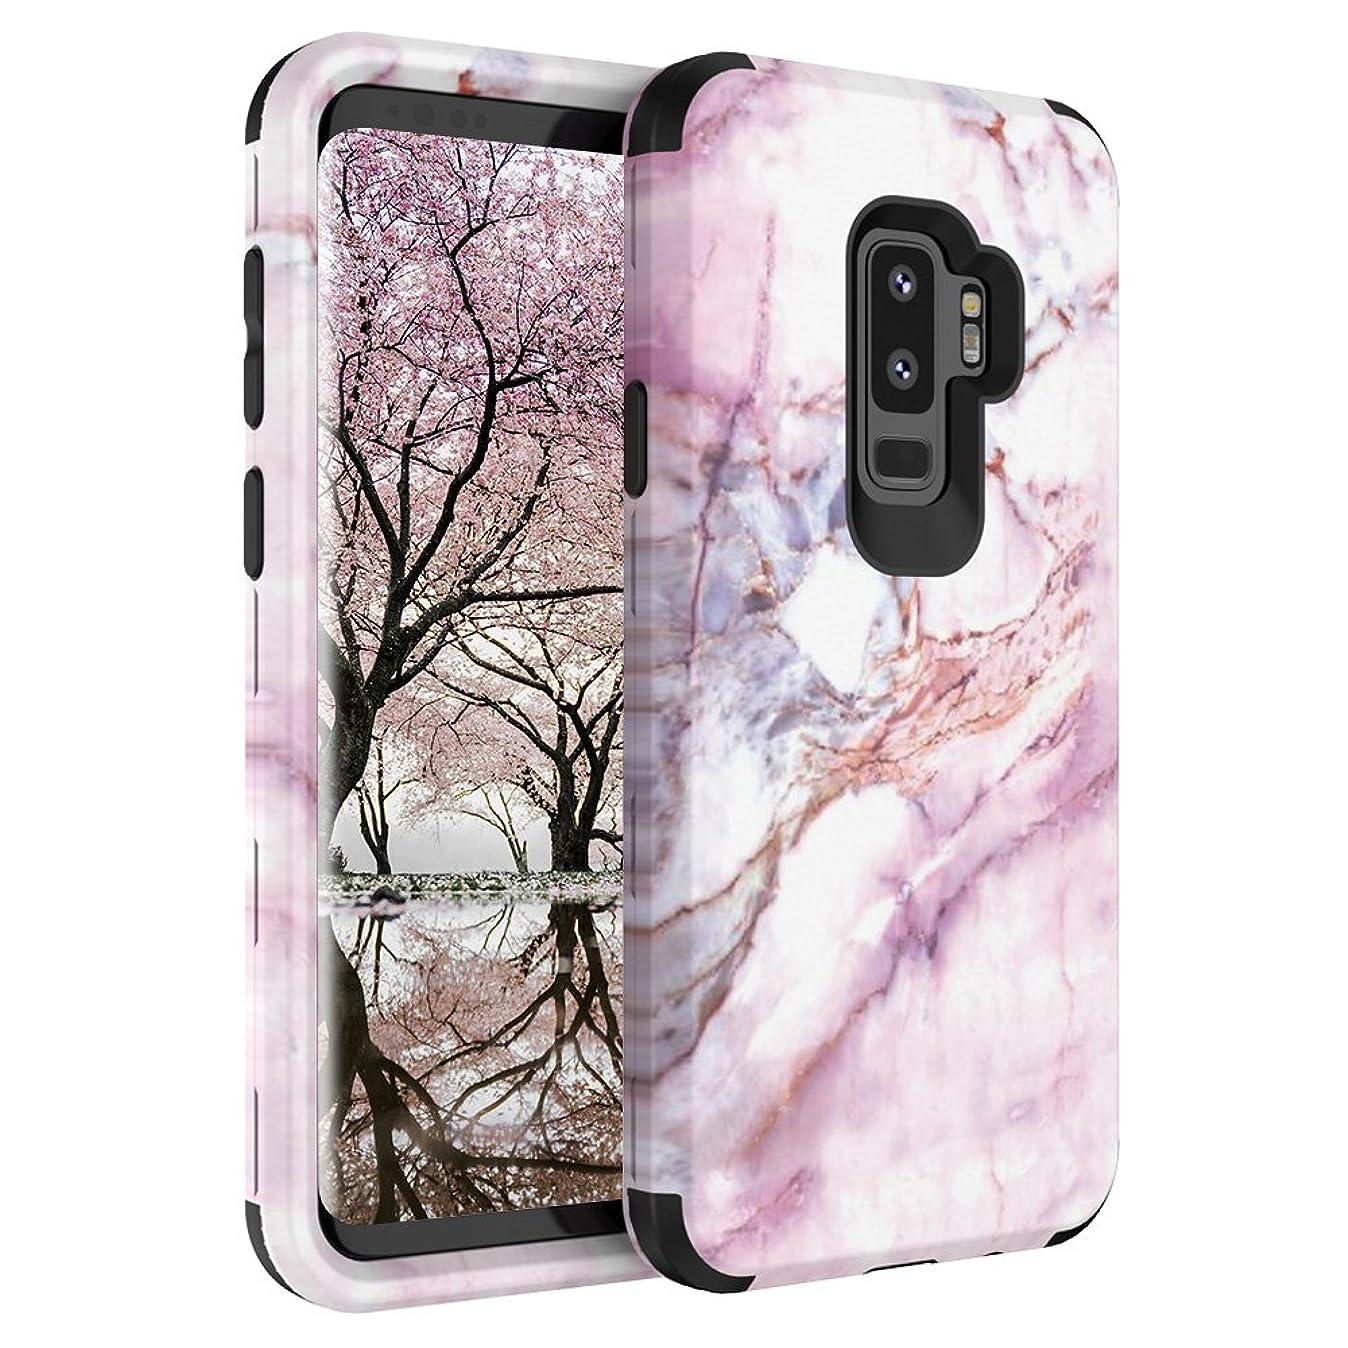 Galaxy S9 Plus Case, CTREEY Marble Pattern Raised Edge Anti-Scratch Shock Proof Dust Proof Anti-Finger Print Soft TPU Case for Samsung Galaxy S9 Plus (Black) v8328214176